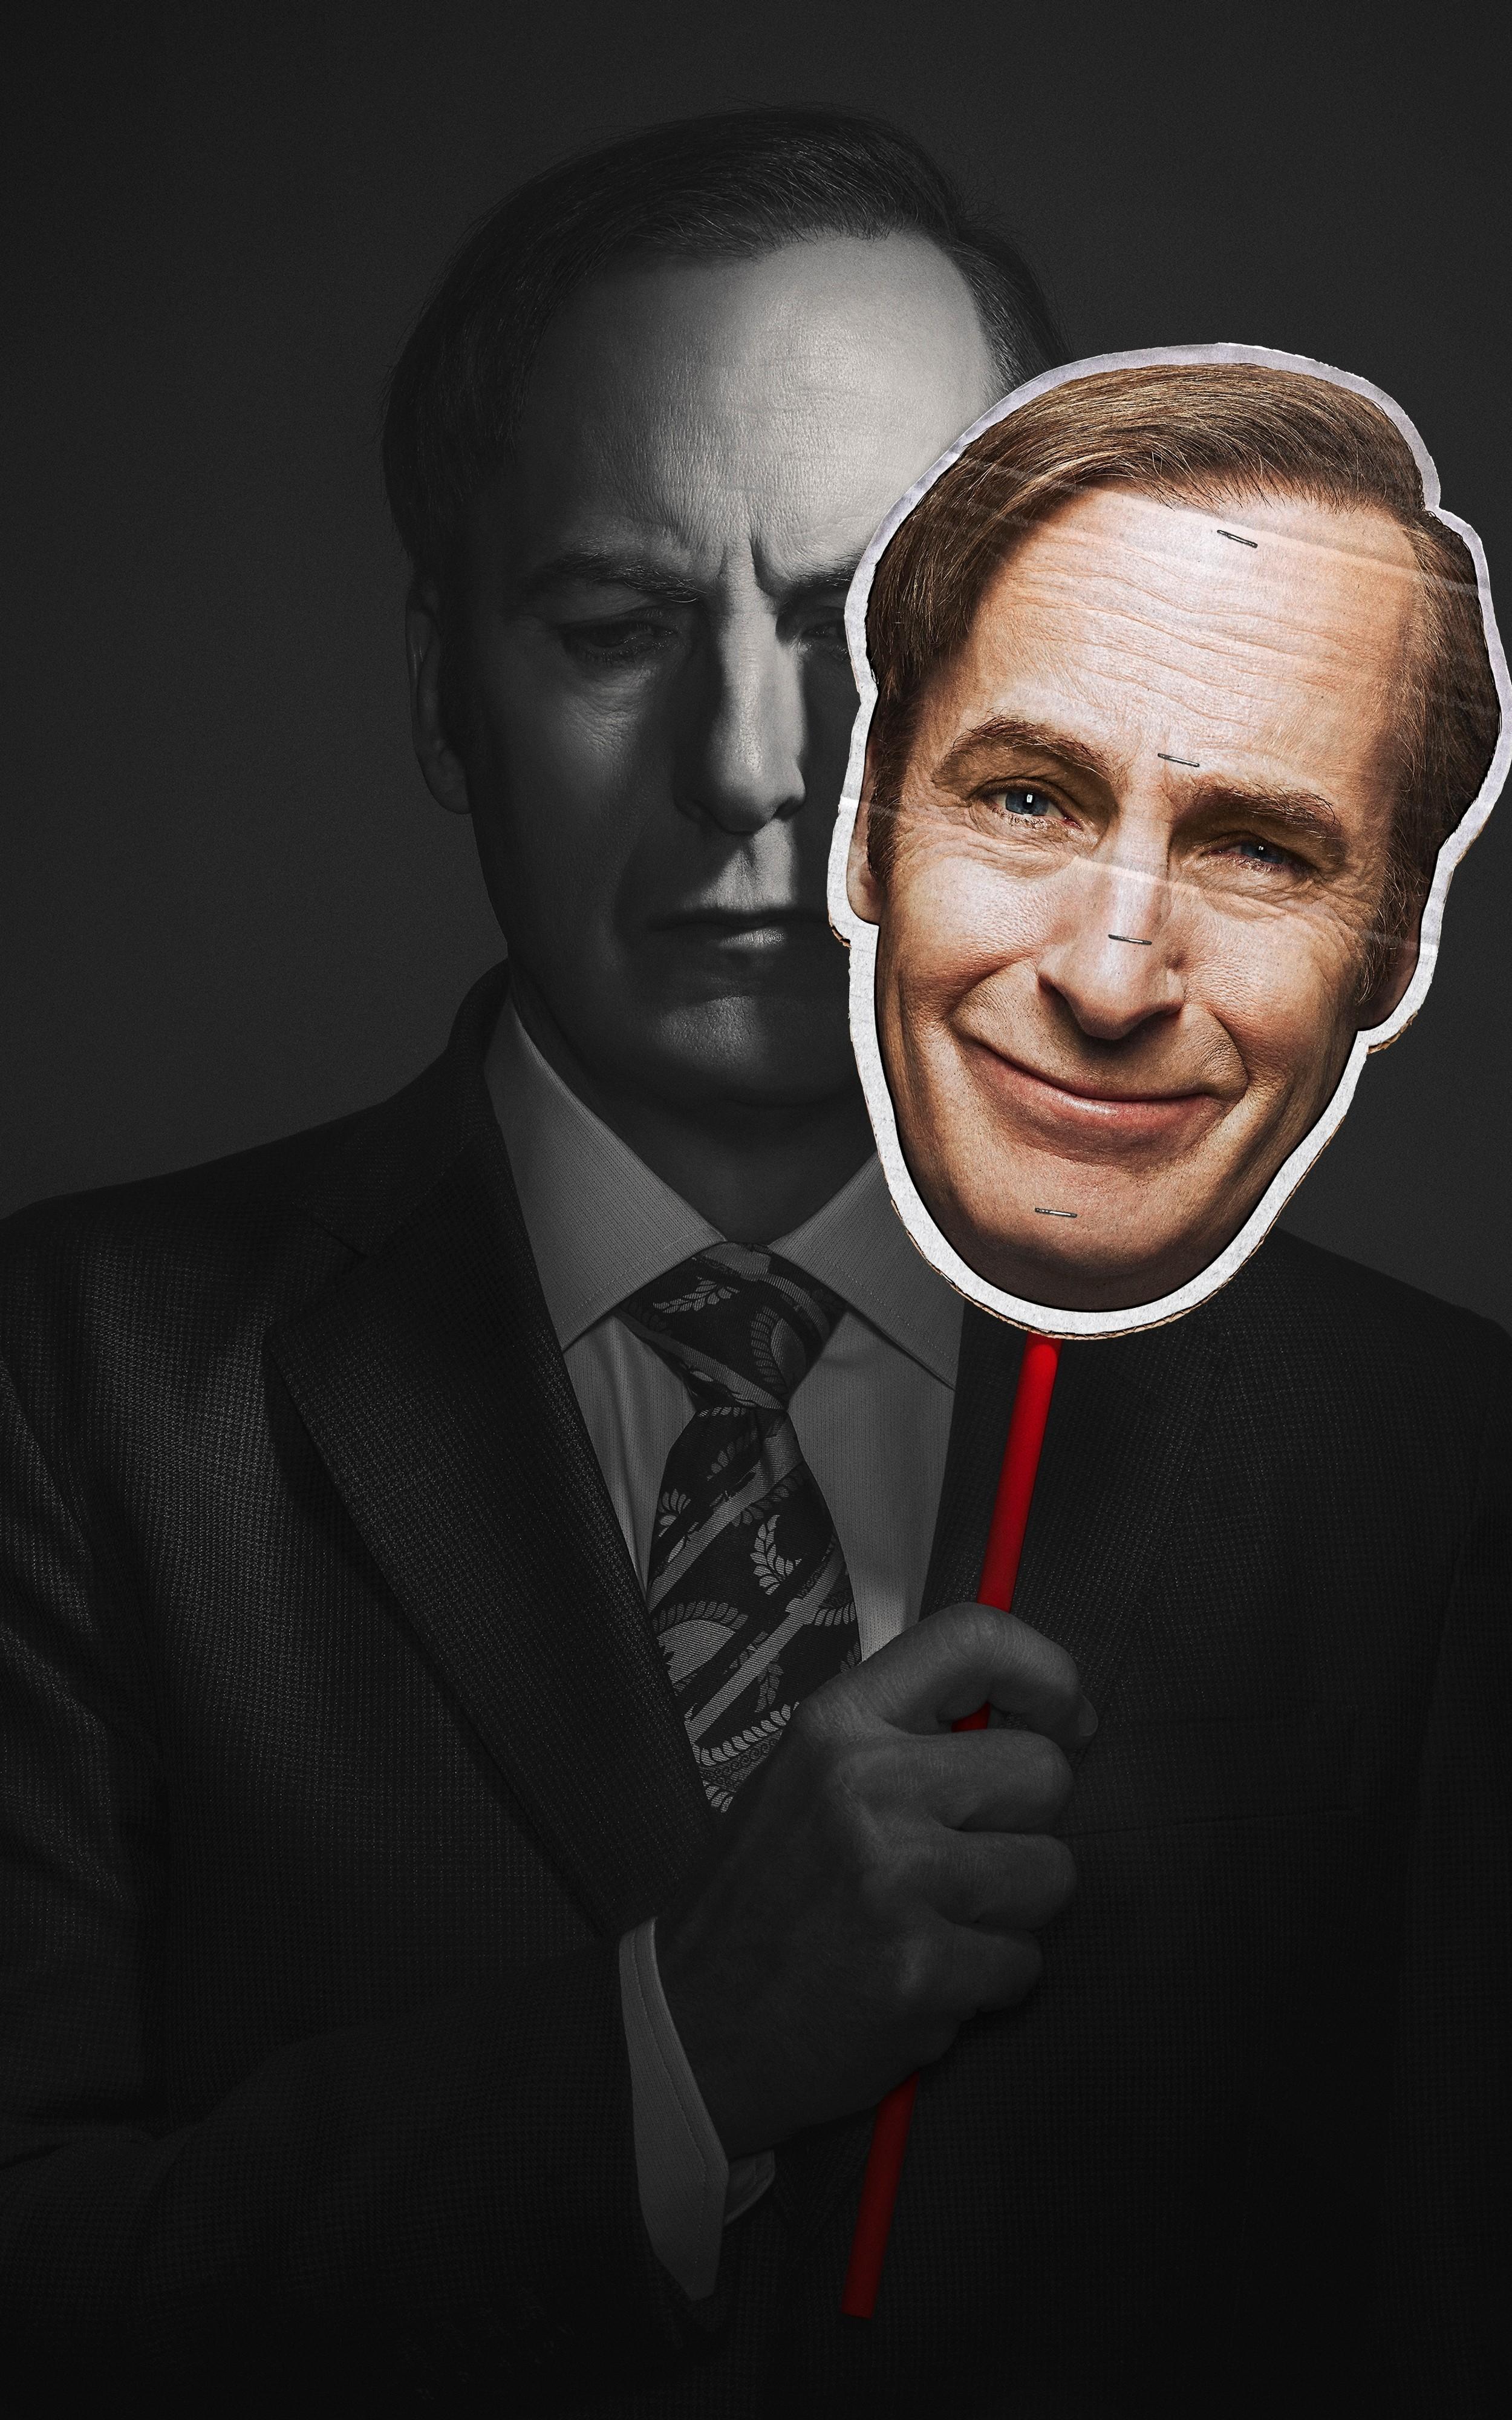 Foto de Fondos de pantalla de 'Breaking Bad' y 'Better Call Saul' (7/15)